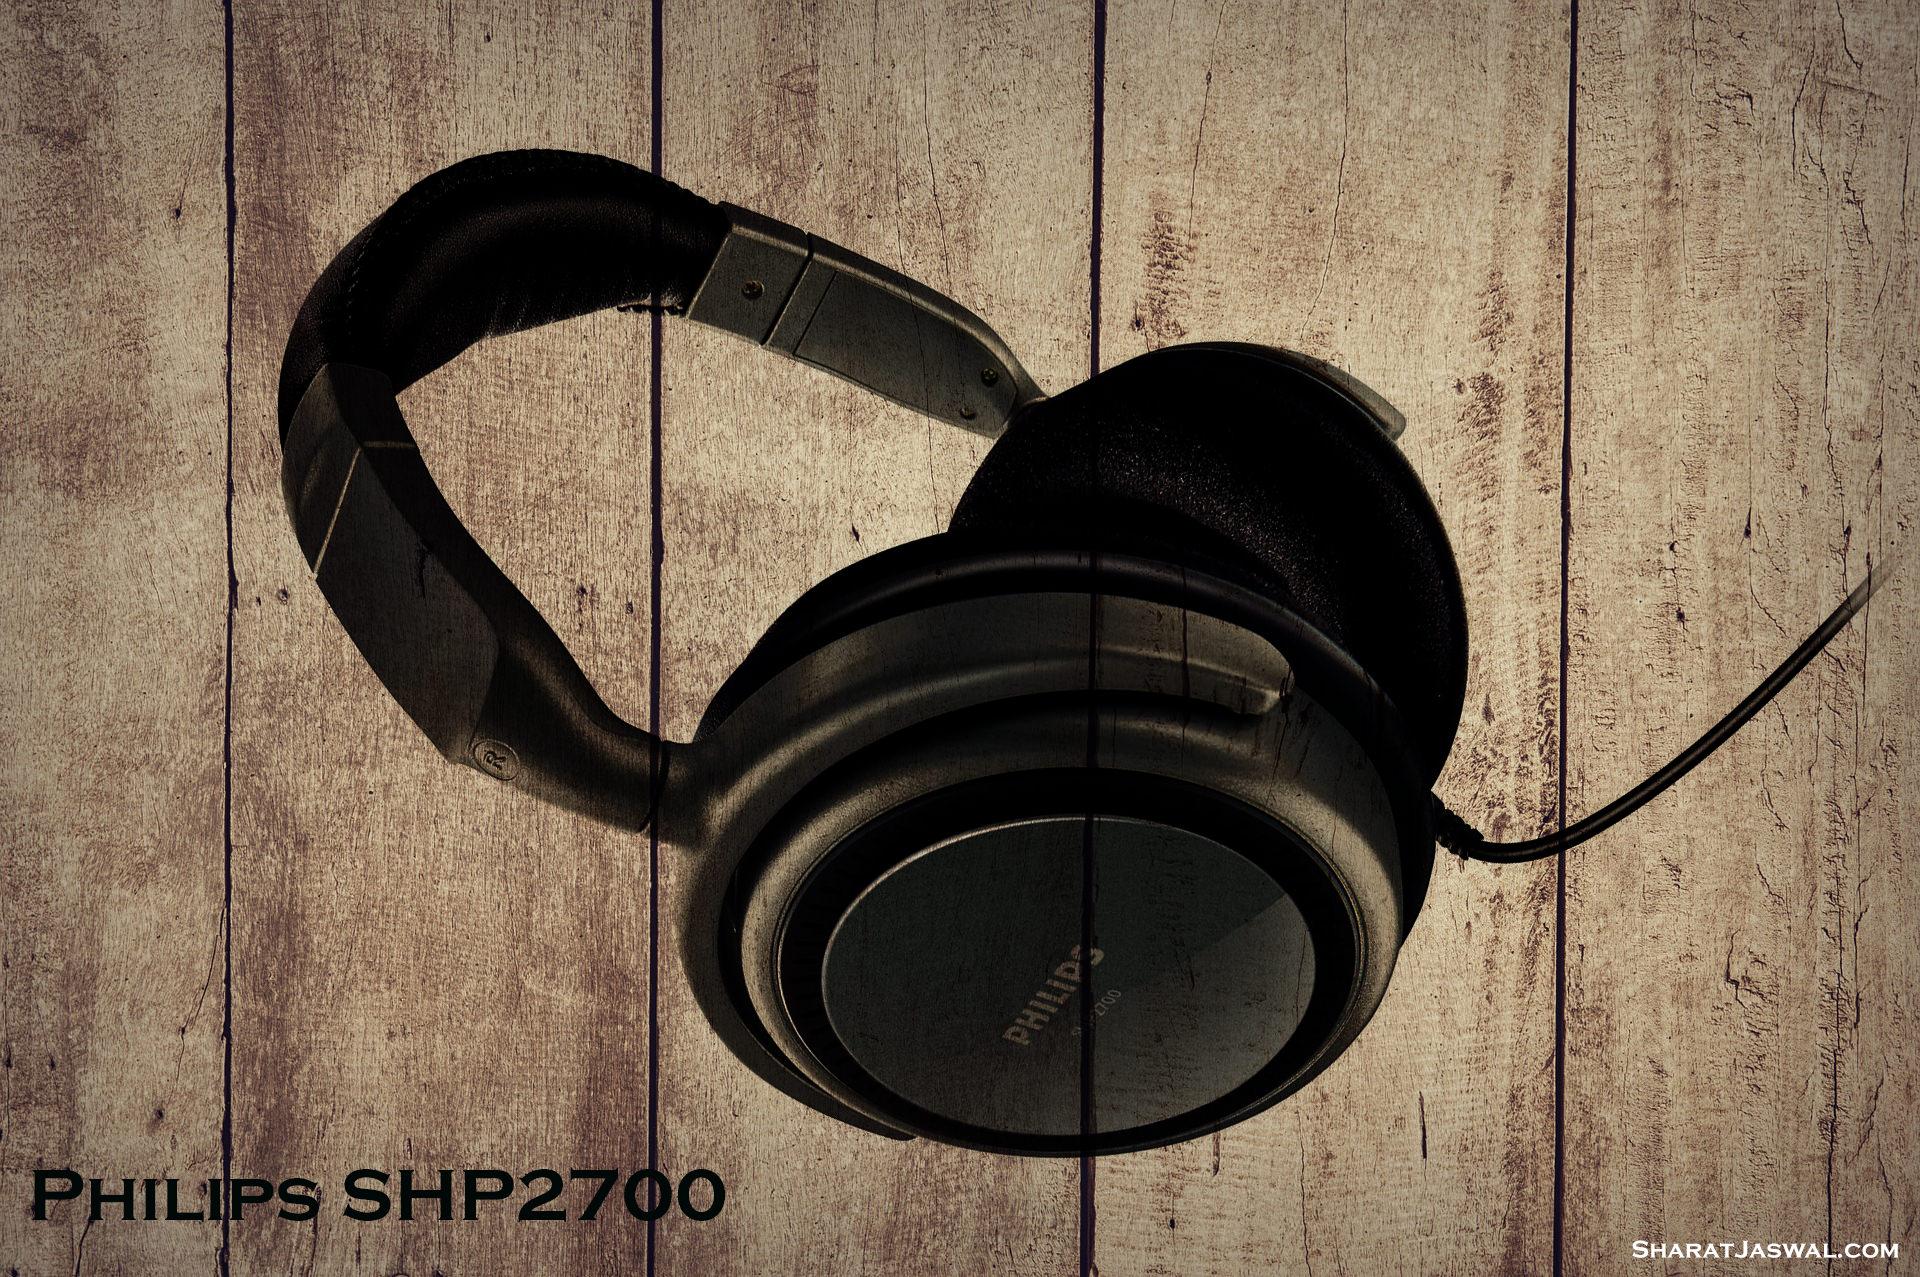 Philips SHP2700